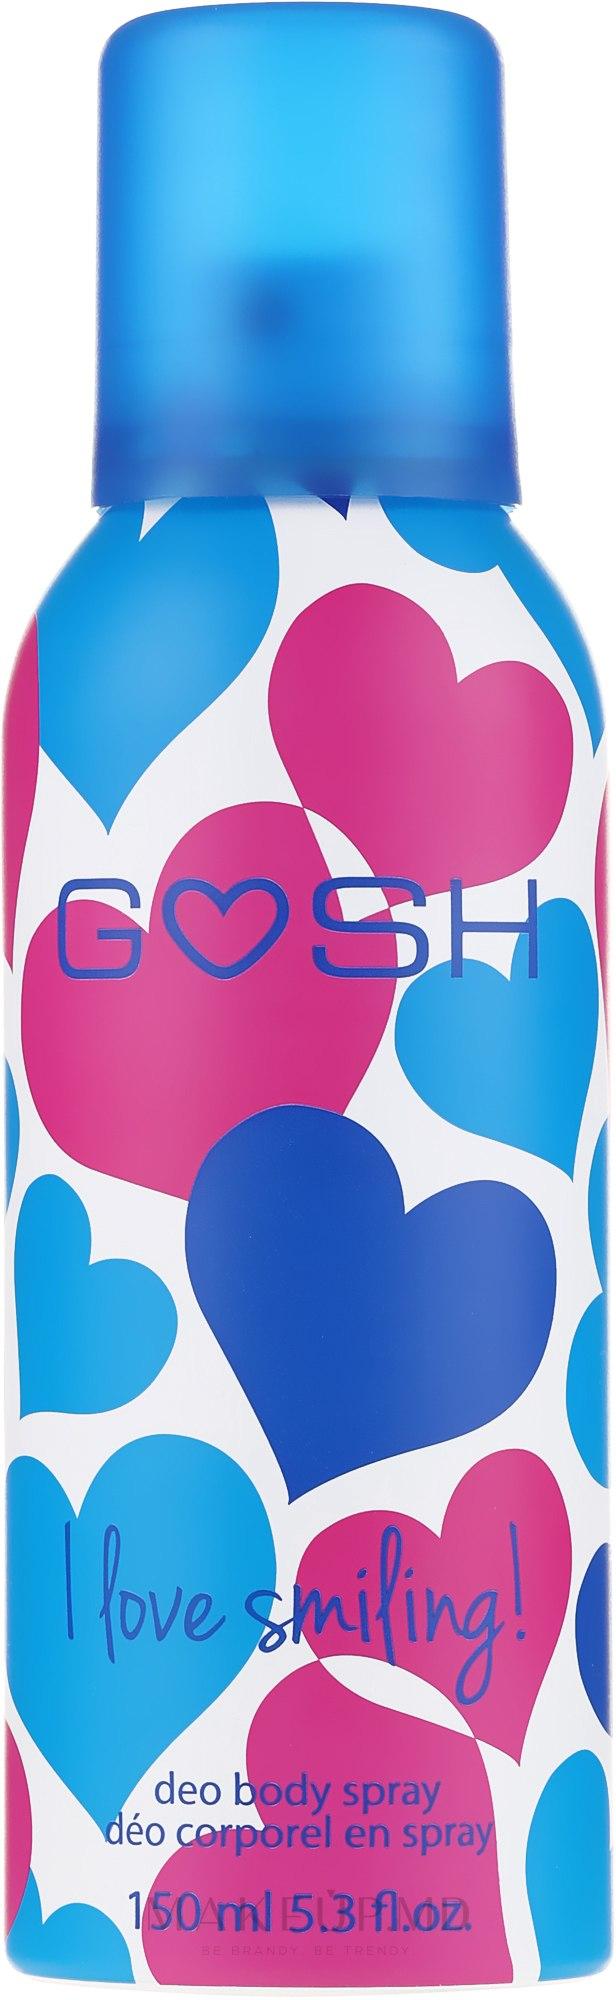 Deodorant-spray - Gosh I Love Smiling Deo Body Spray — Imagine 150 ml